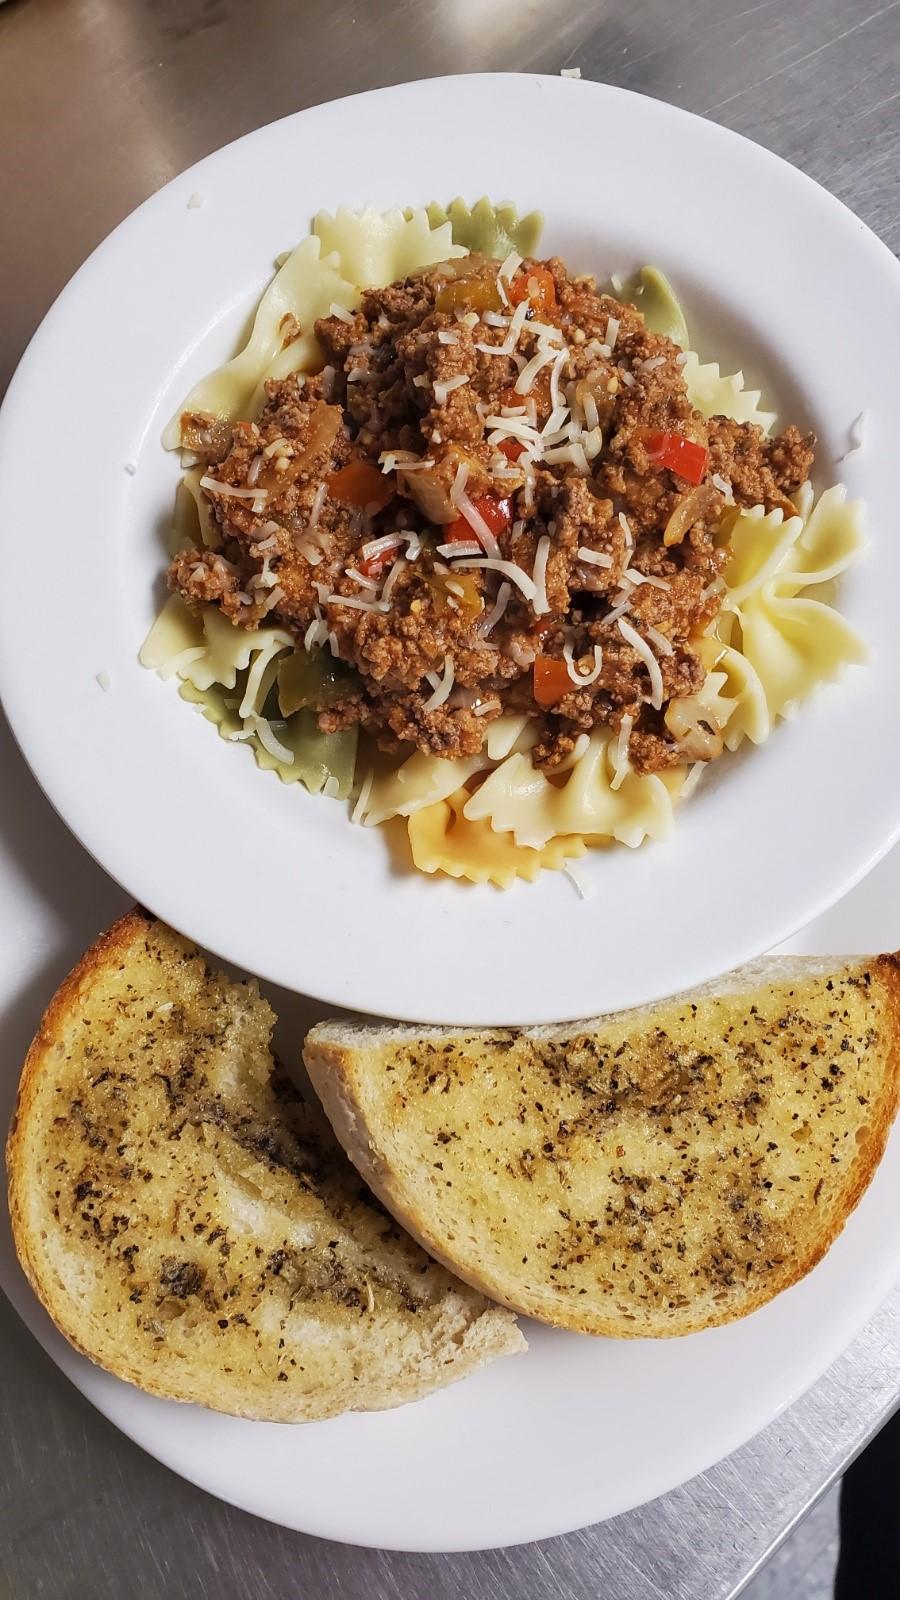 Bowtie pasta special